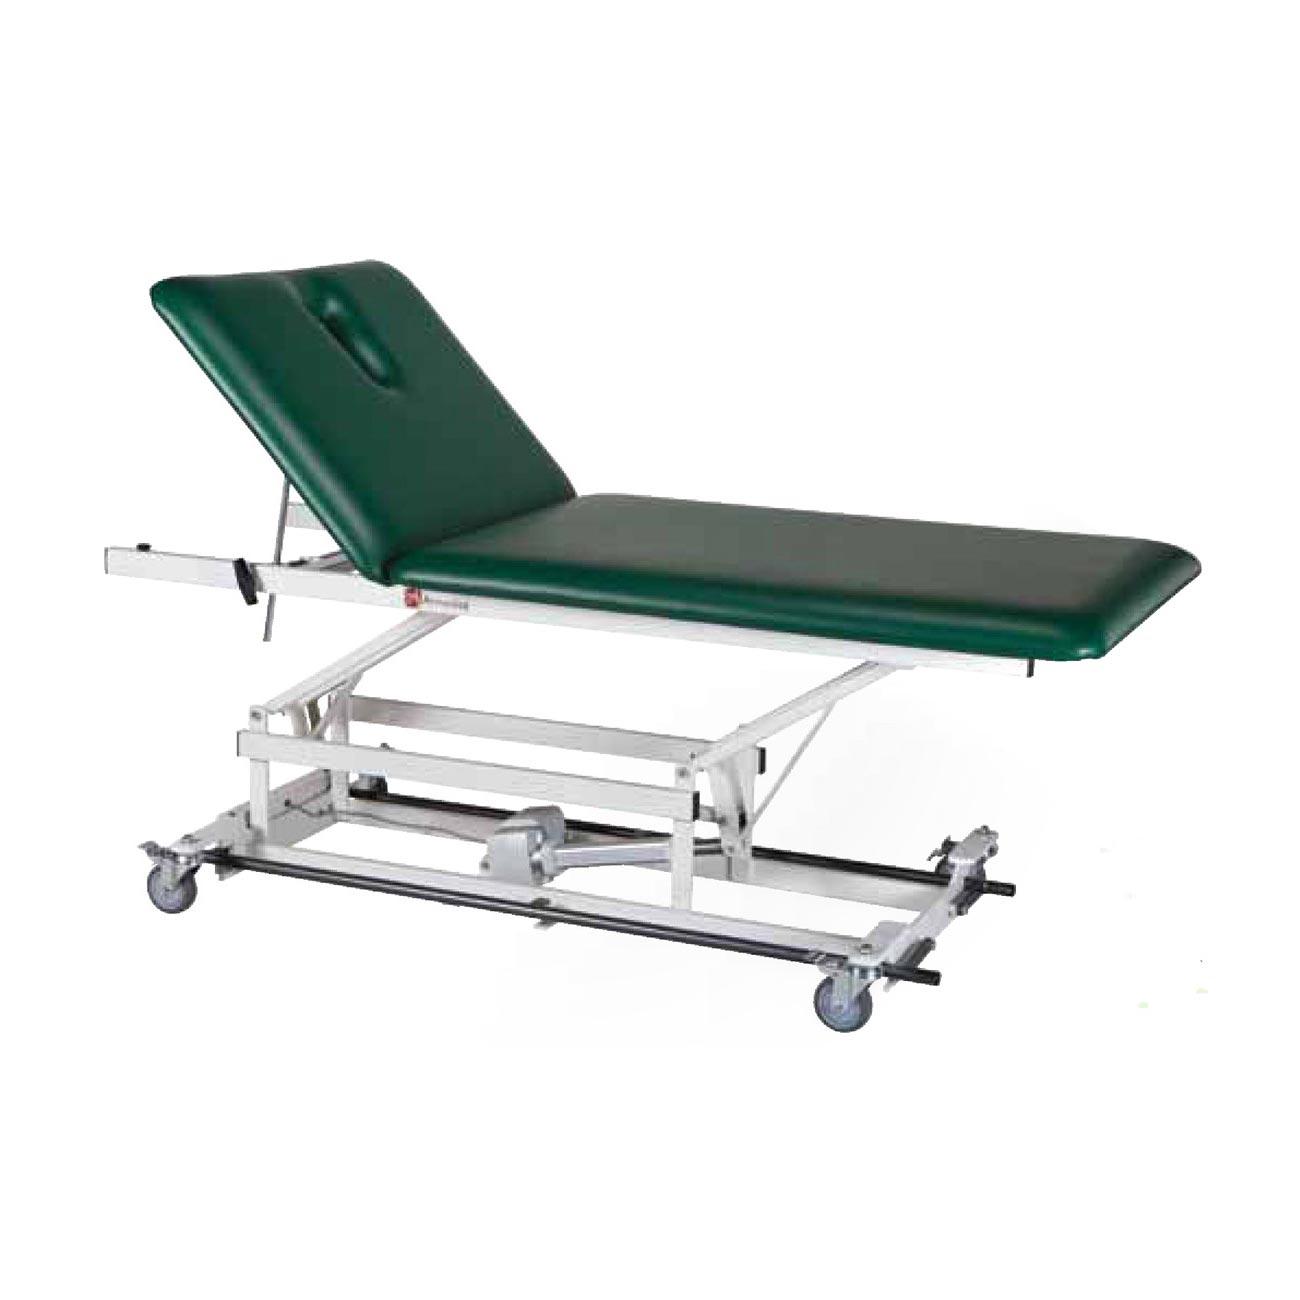 Armedica AM-BA 234 treatment table